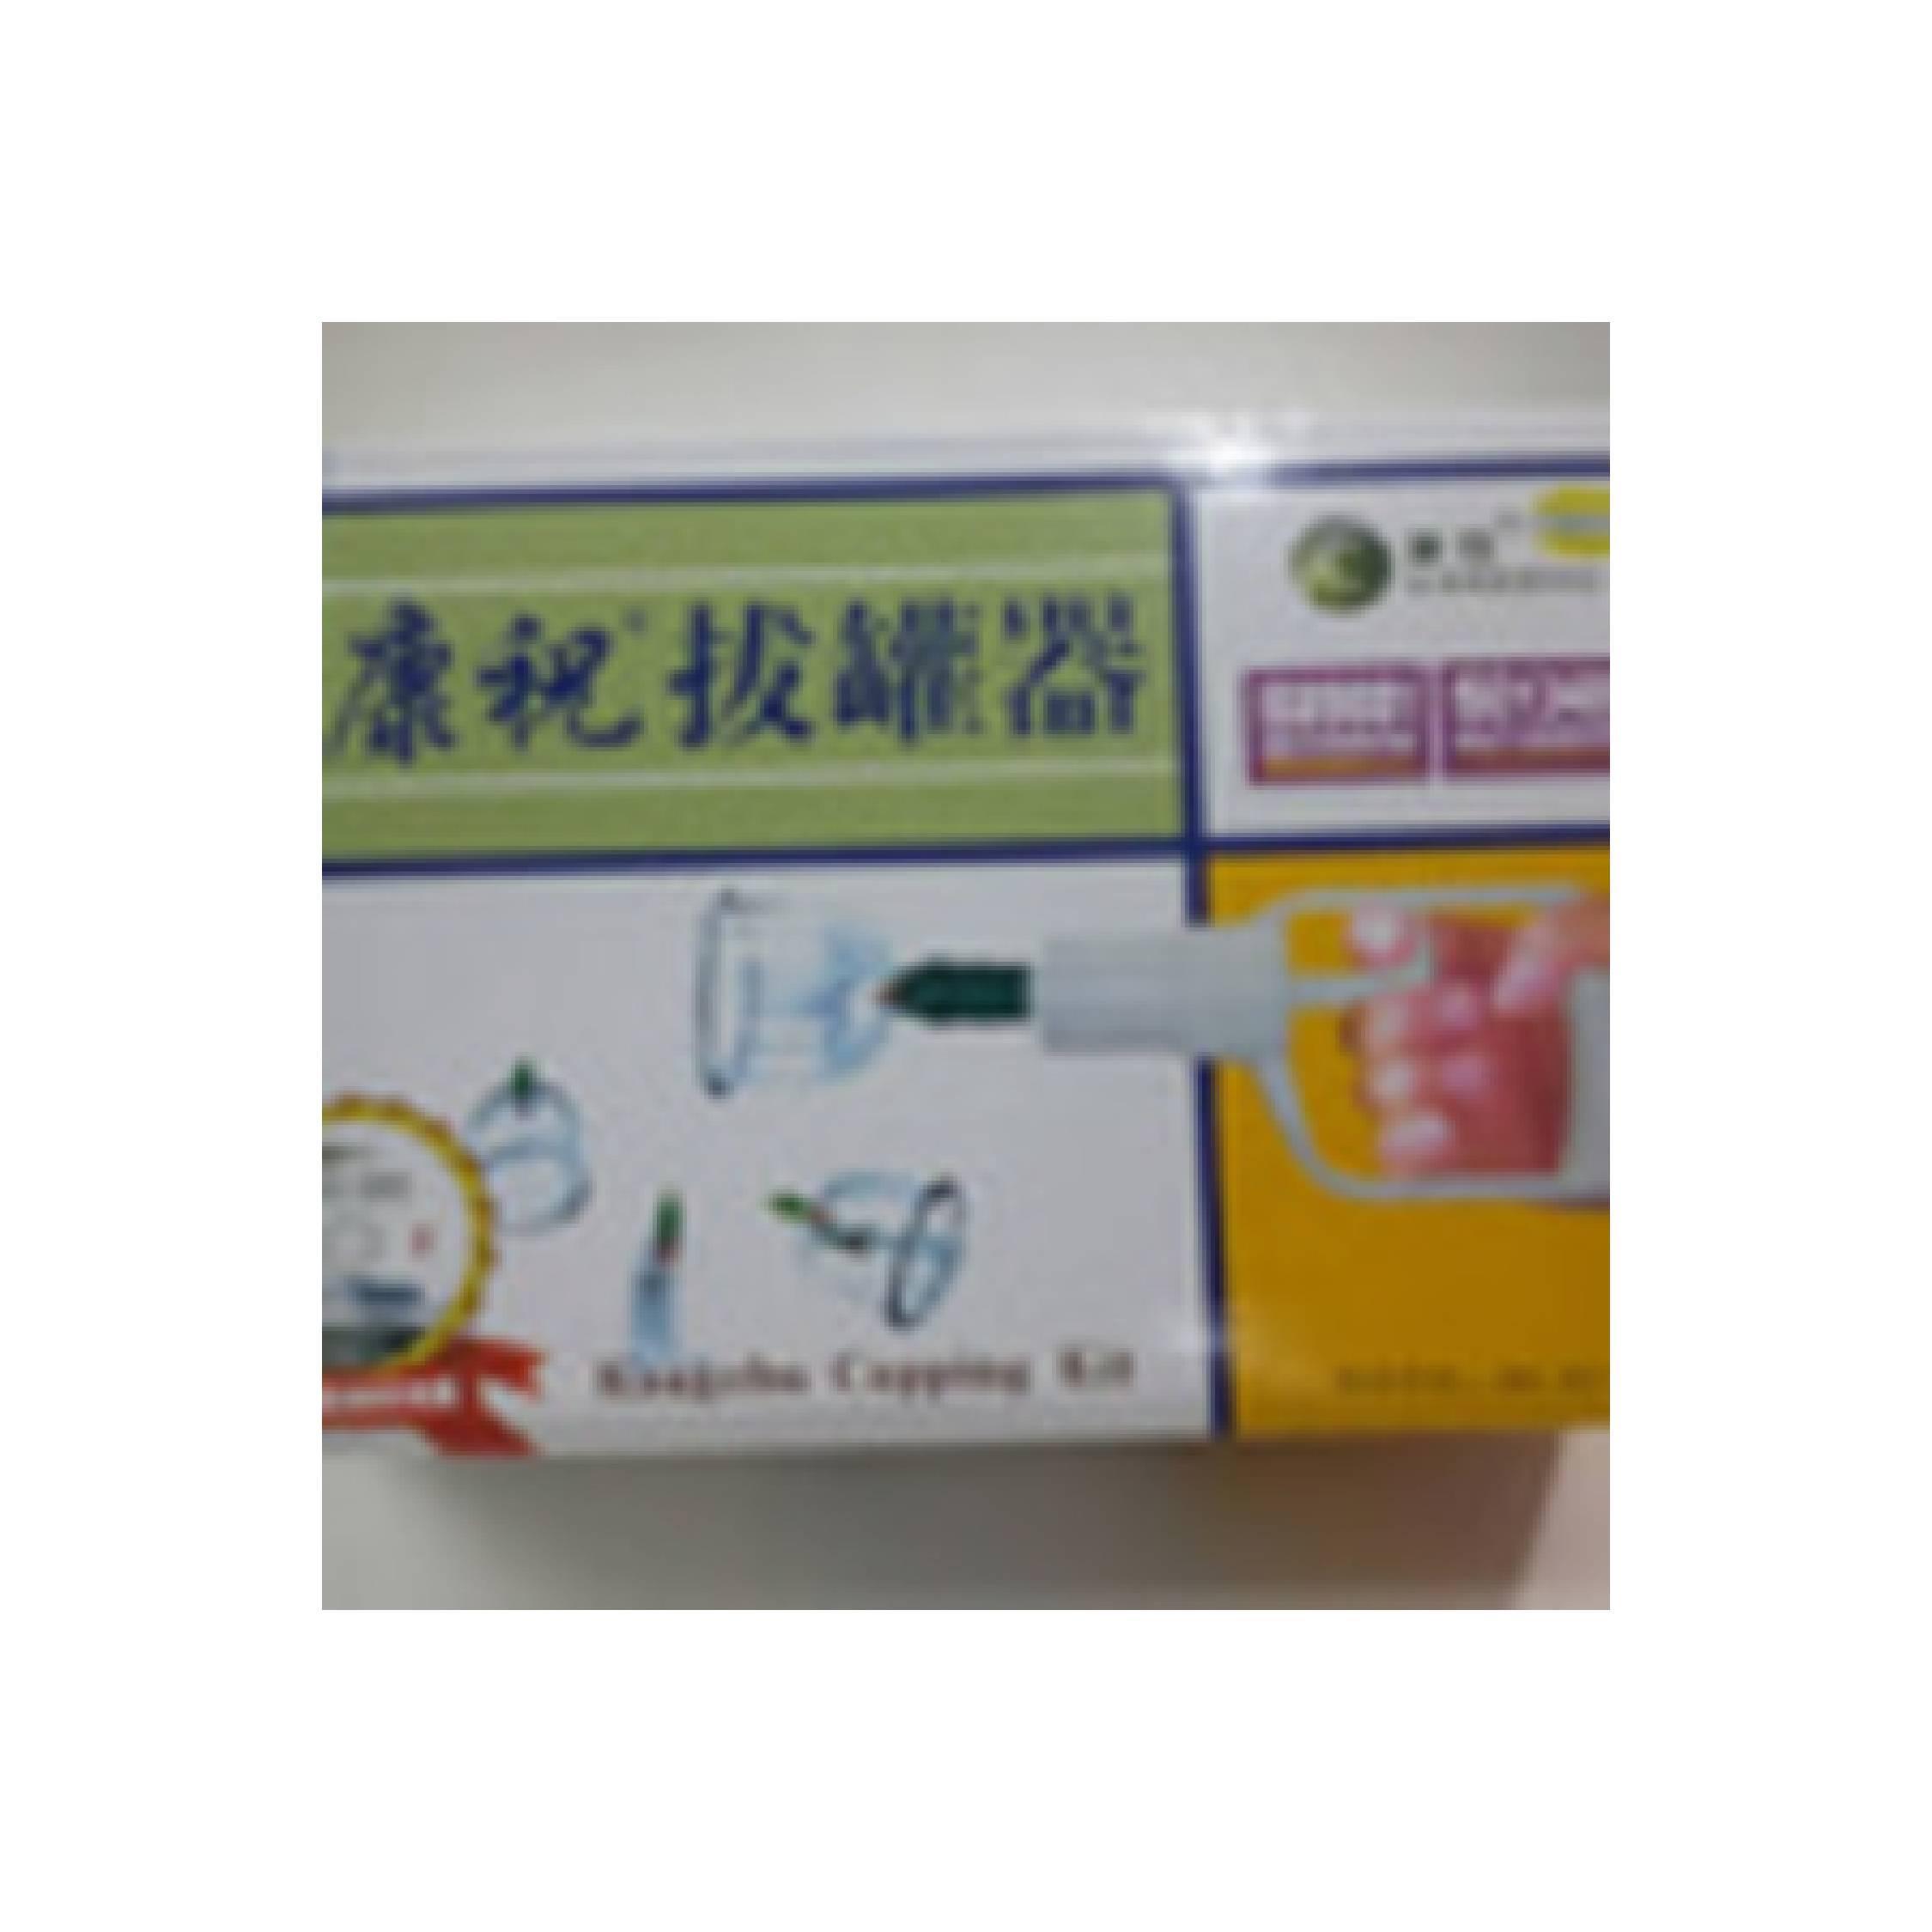 Buy Sell Cheapest Kop Angin Kangzhu Best Quality Product Deals Kang Zhu 12 Bekam Atau Isi Cup